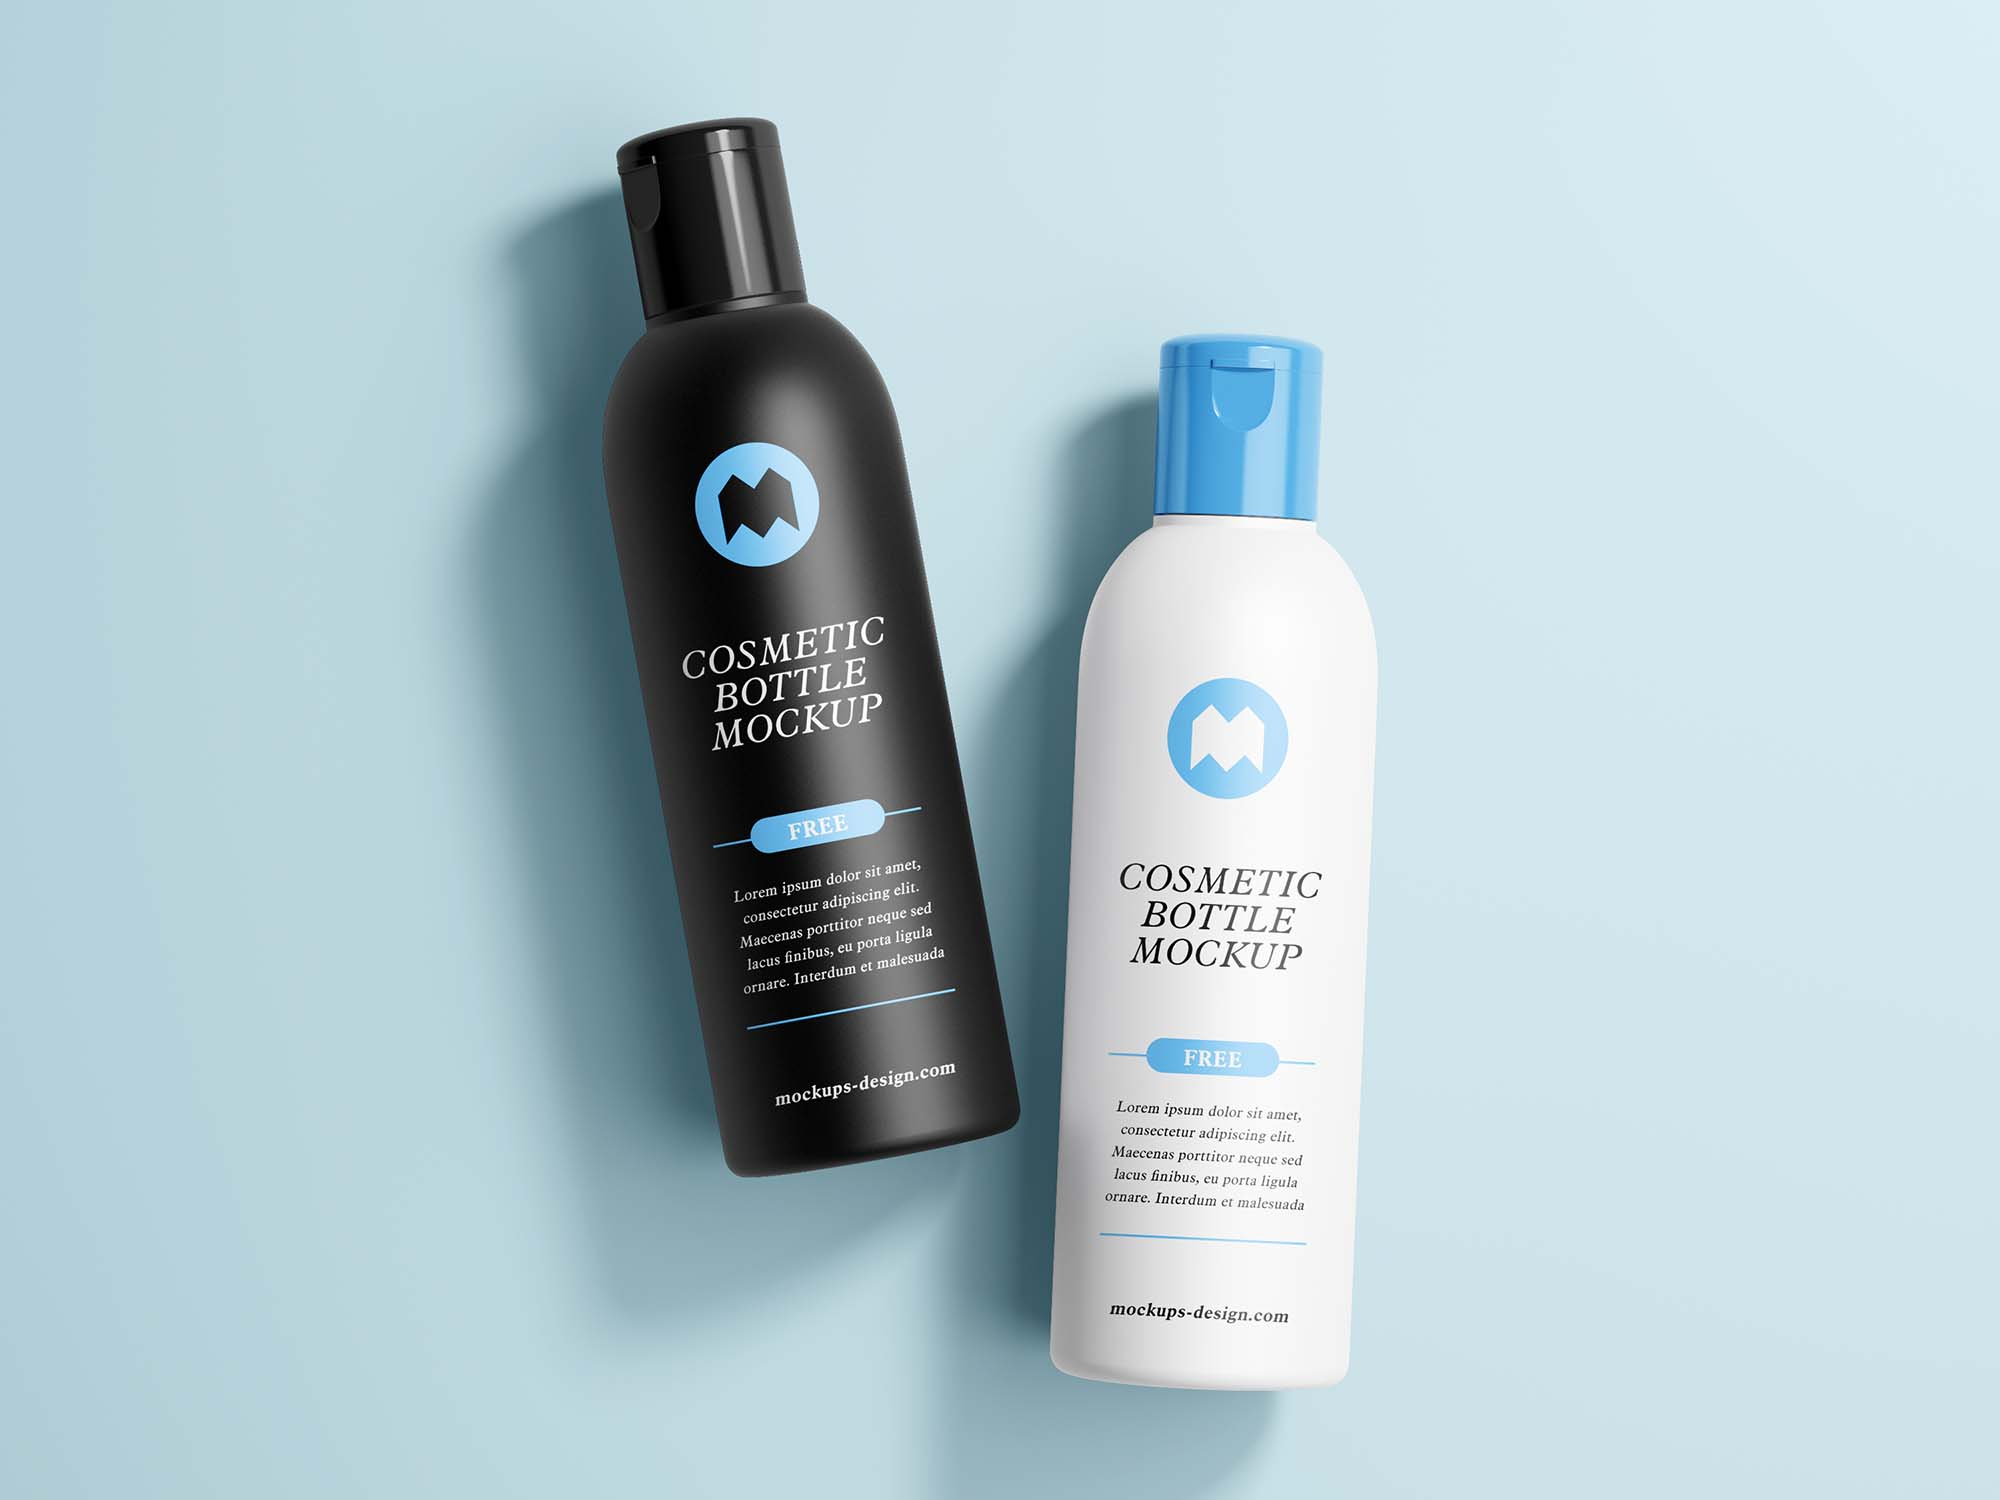 Cosmetics Bottle MockupCosmetics Bottle Mockup